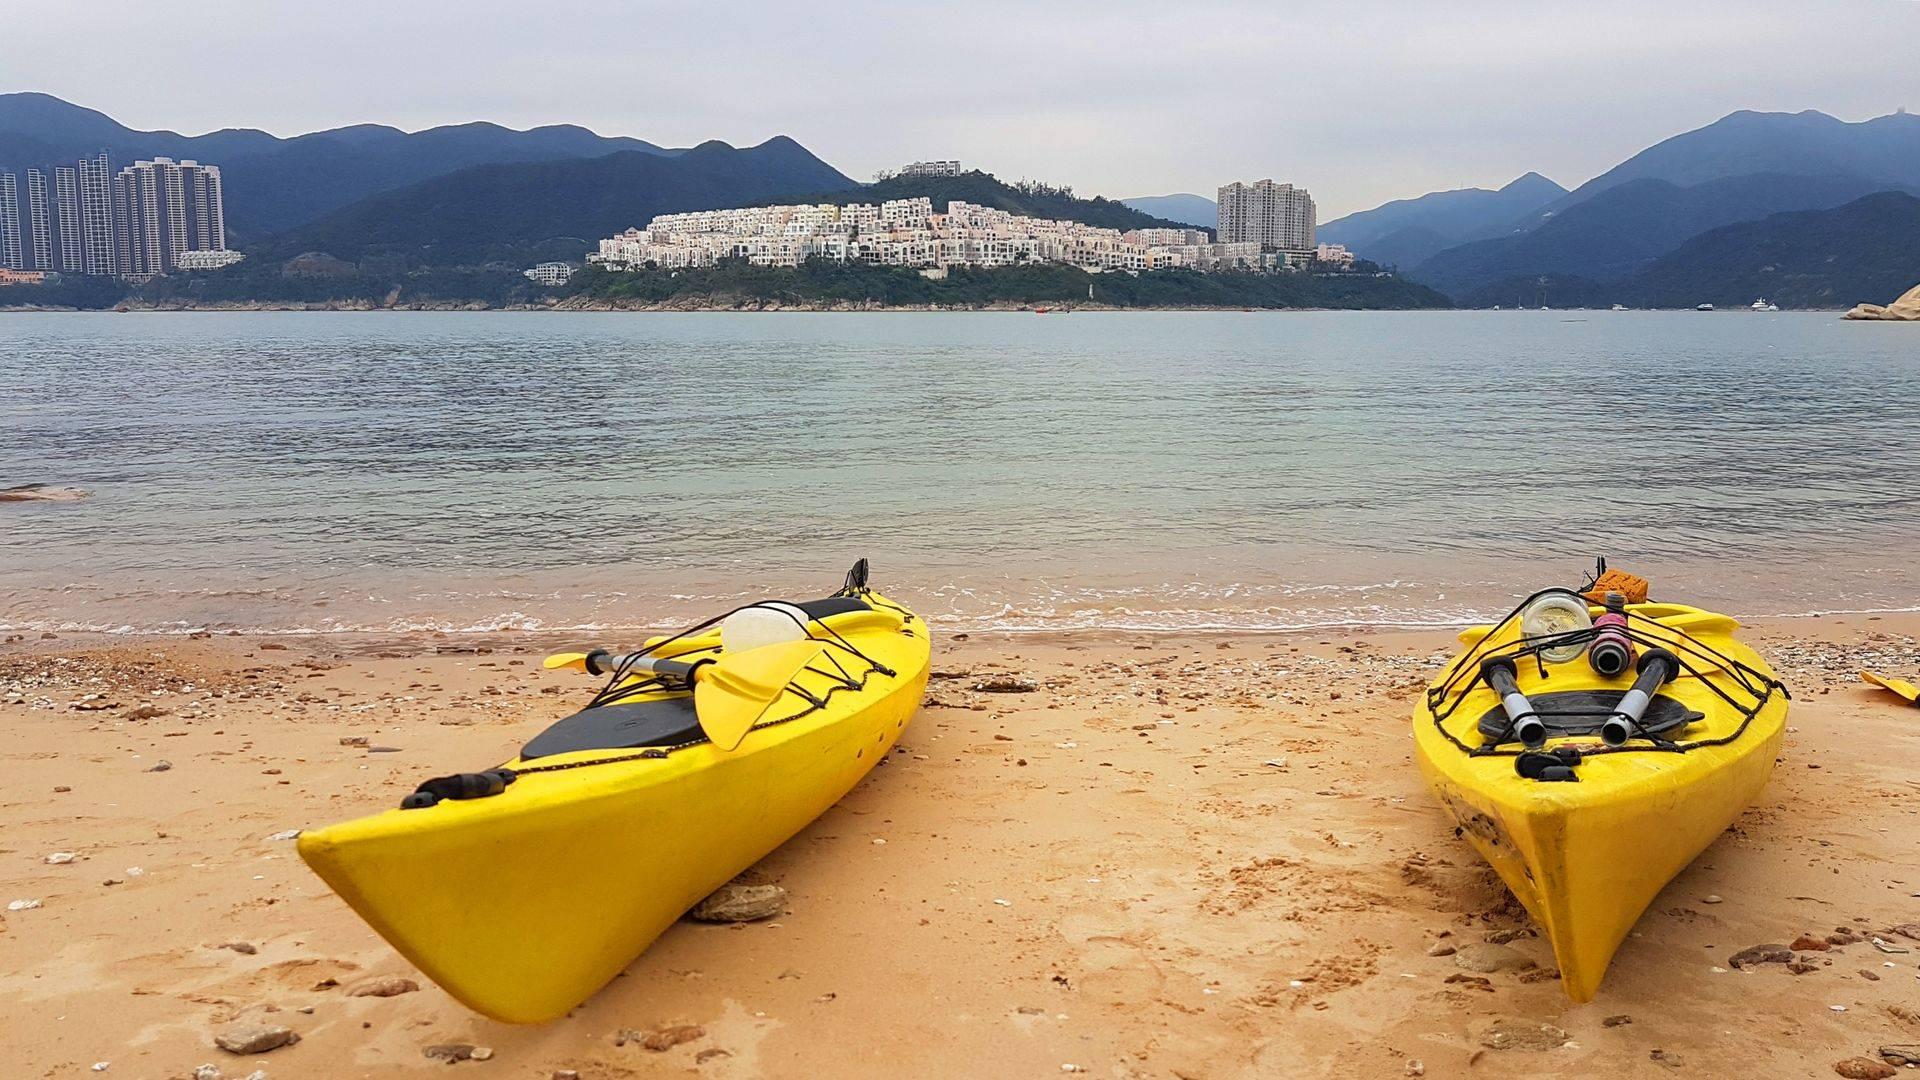 25 Mar 2019 Tai tam sea kayak trip Hong Kong